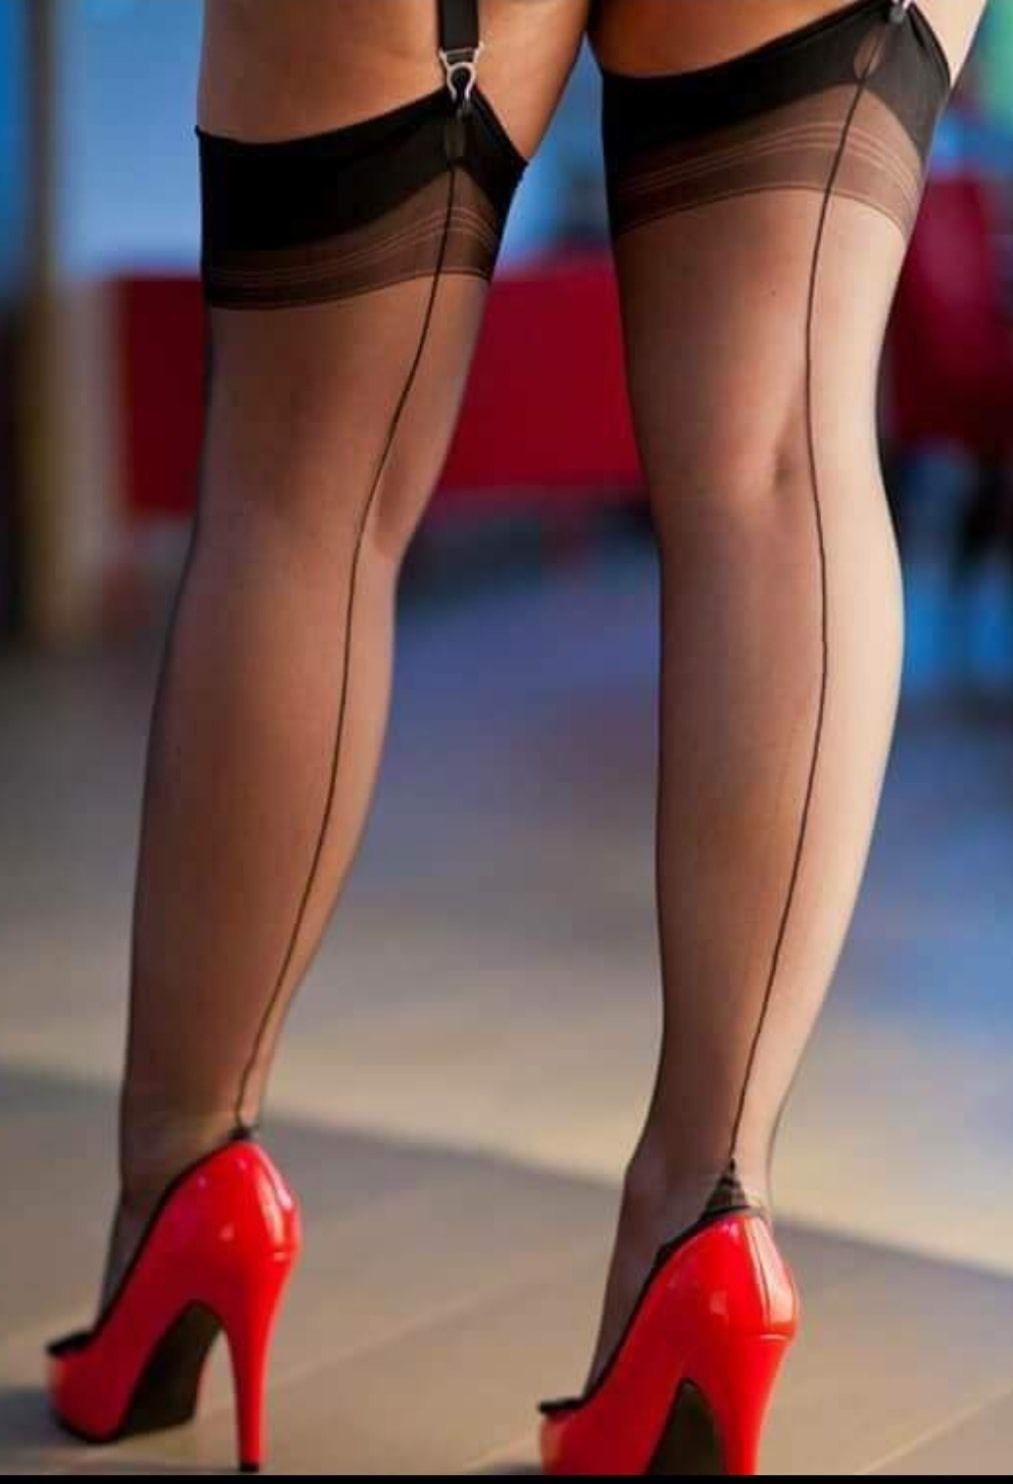 Pin on pantyhose & stockings